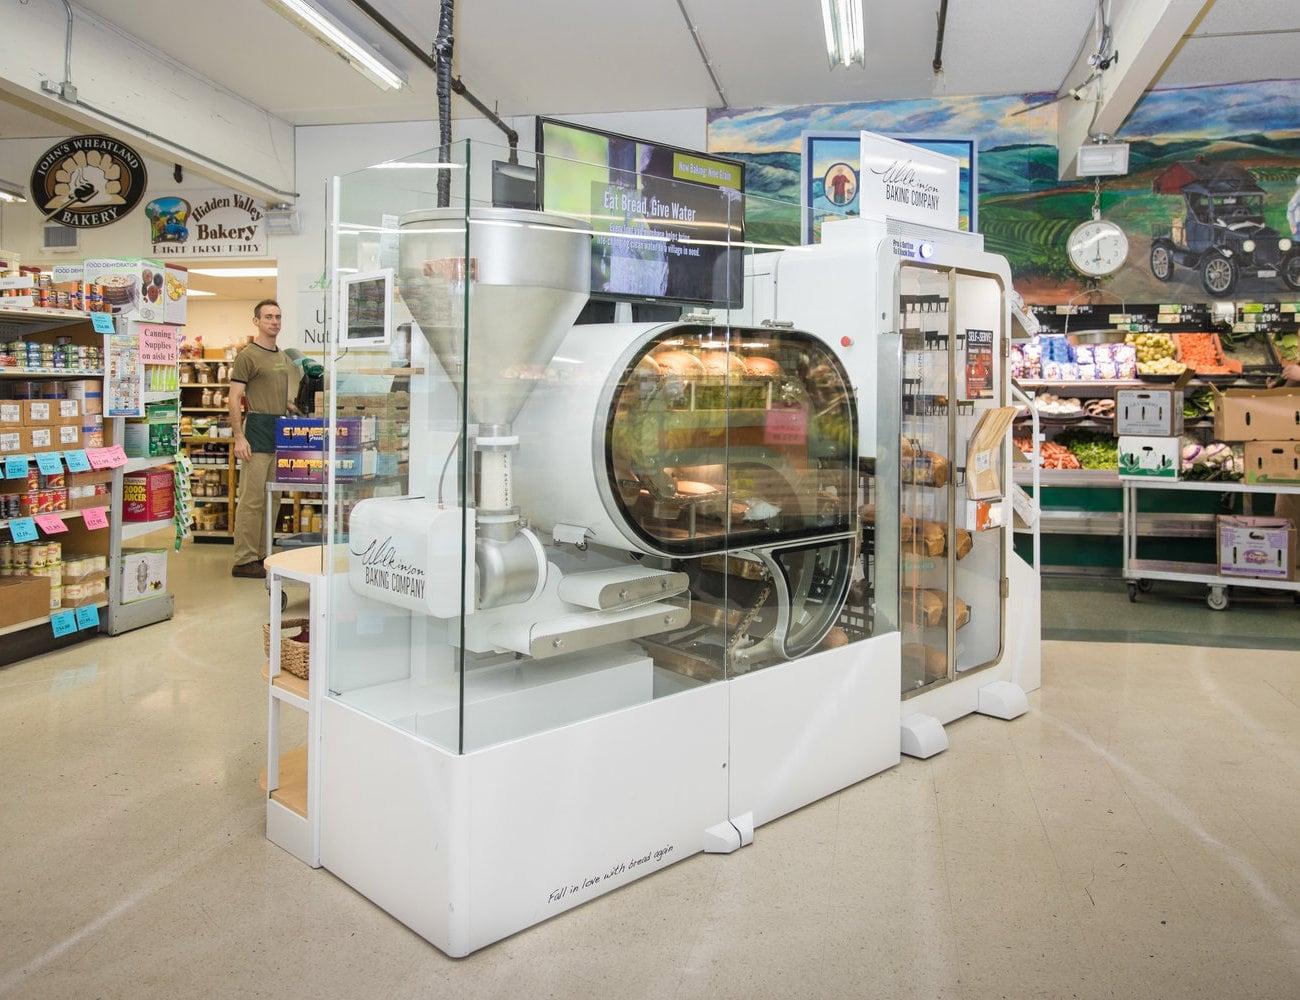 Wilkinson Baking BreadBot Automated Bread Maker